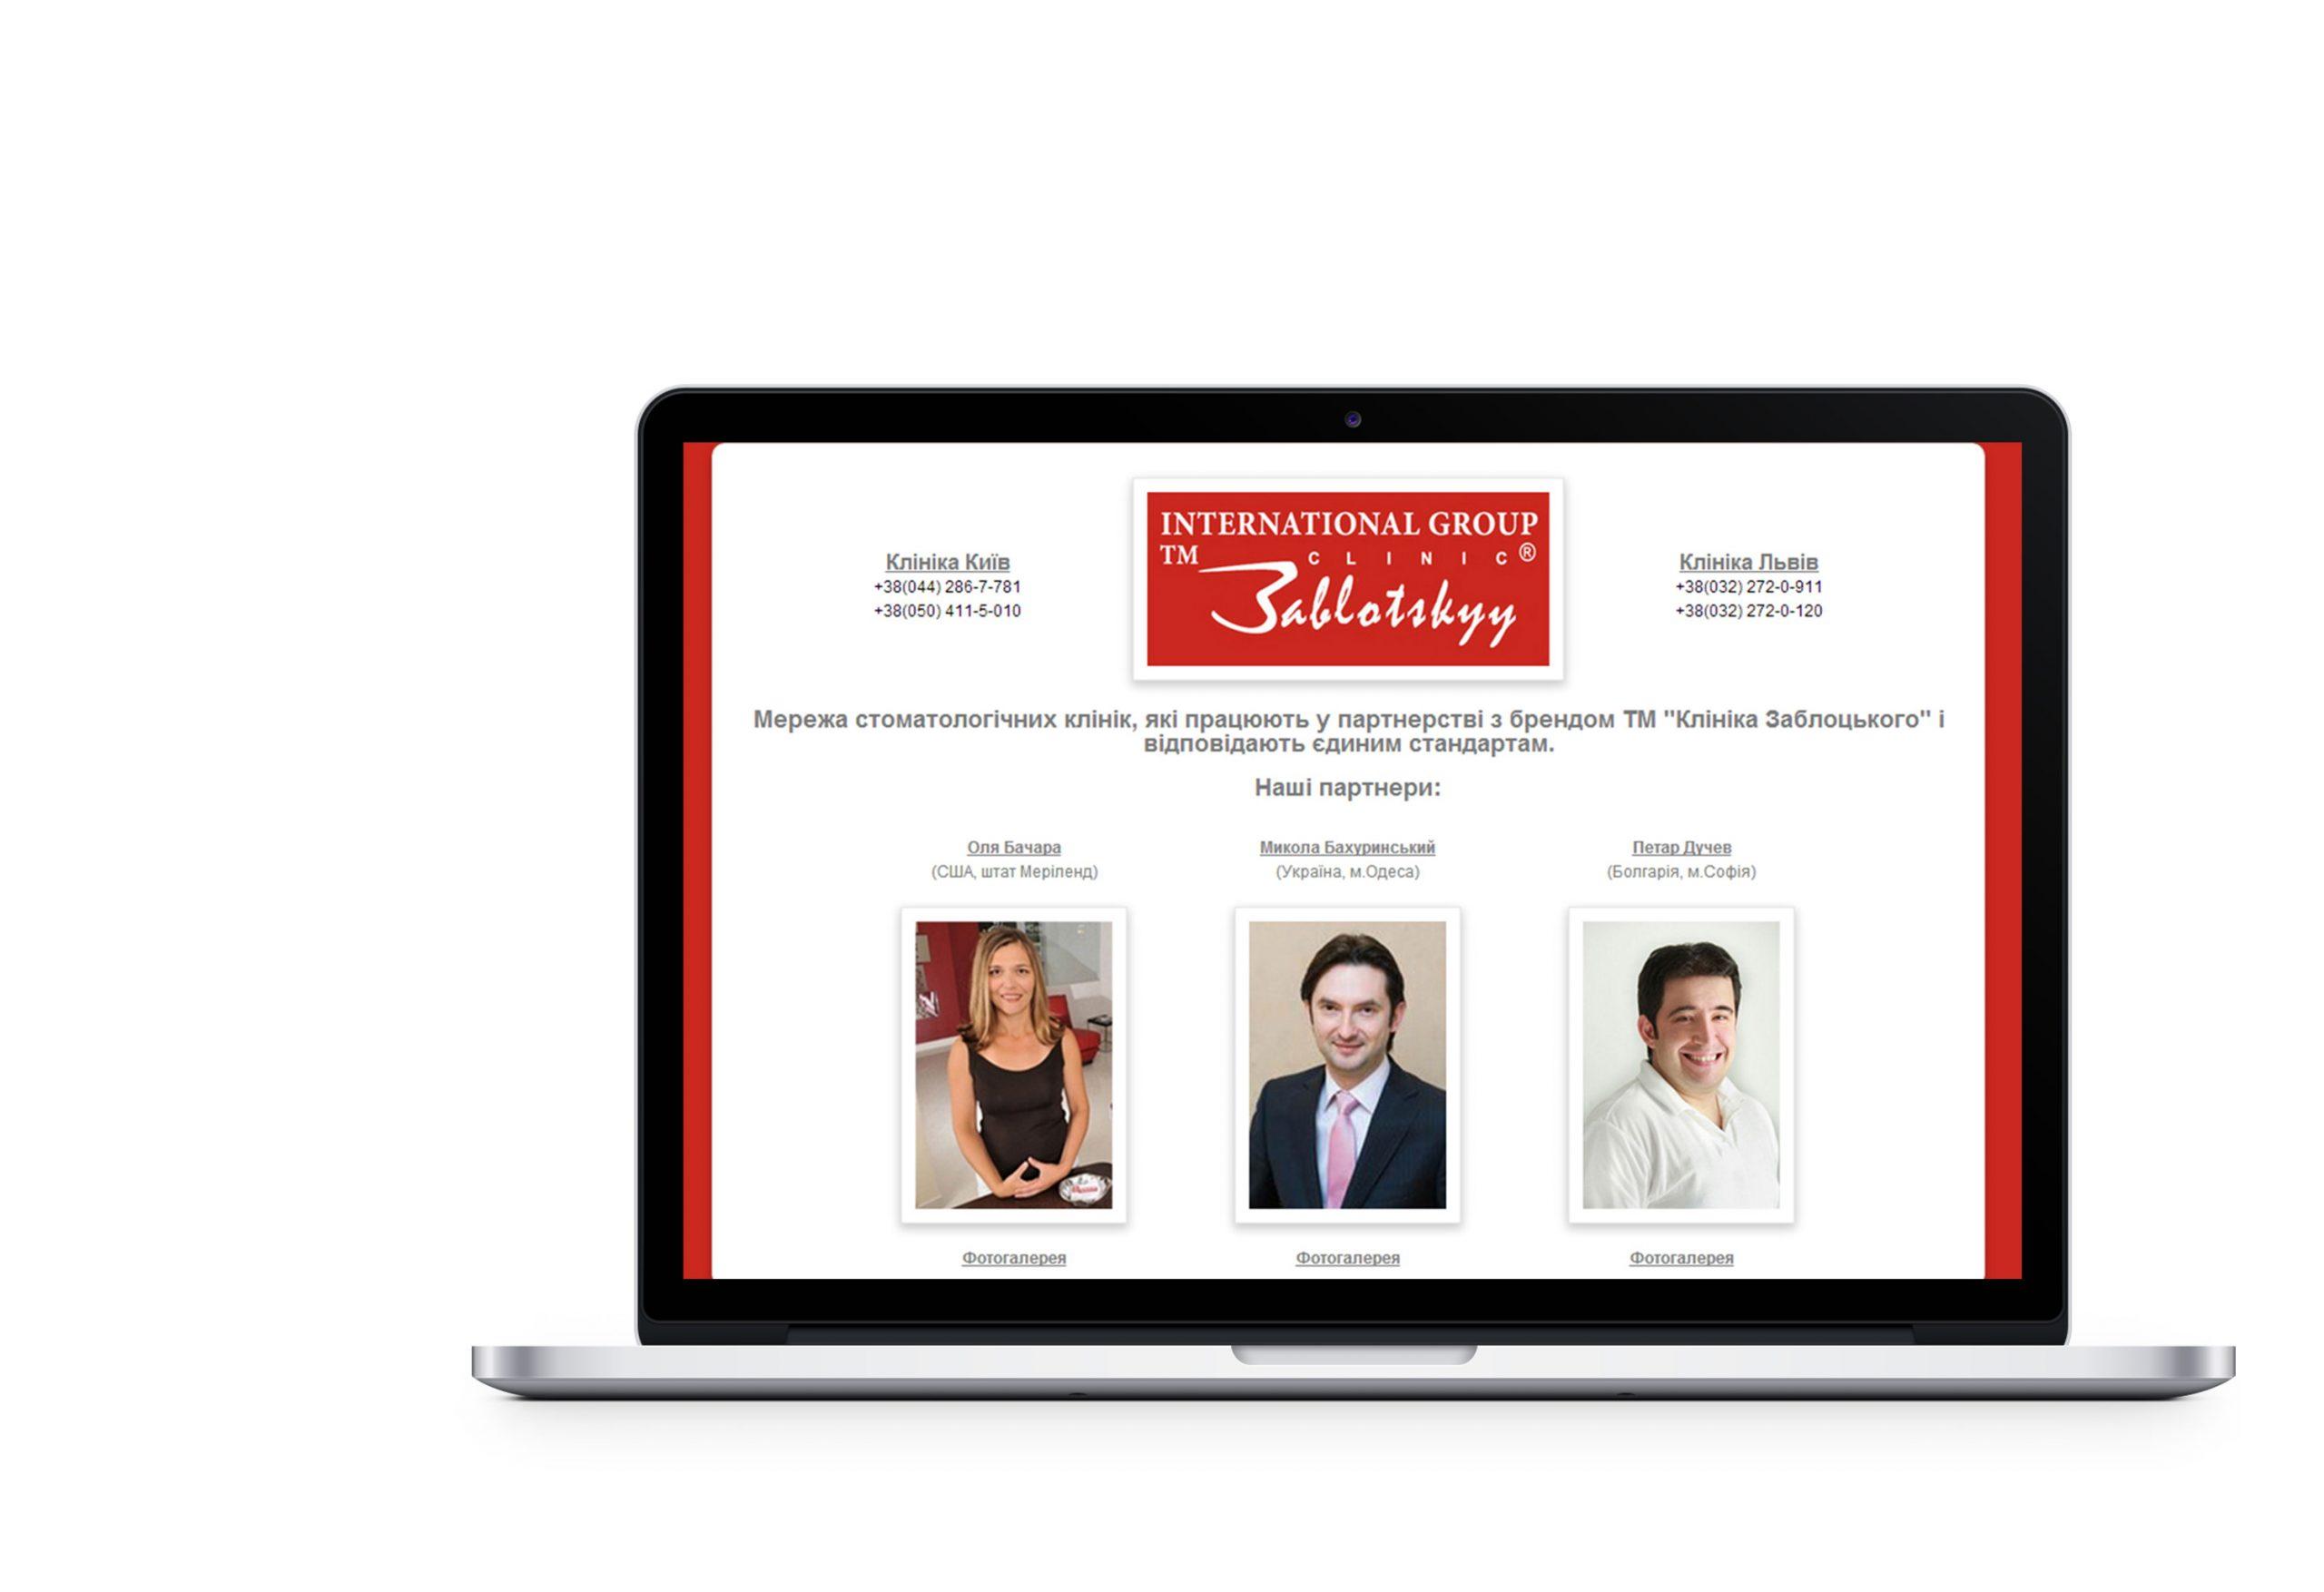 Вебсайт для International Group TM Zablotskyy.